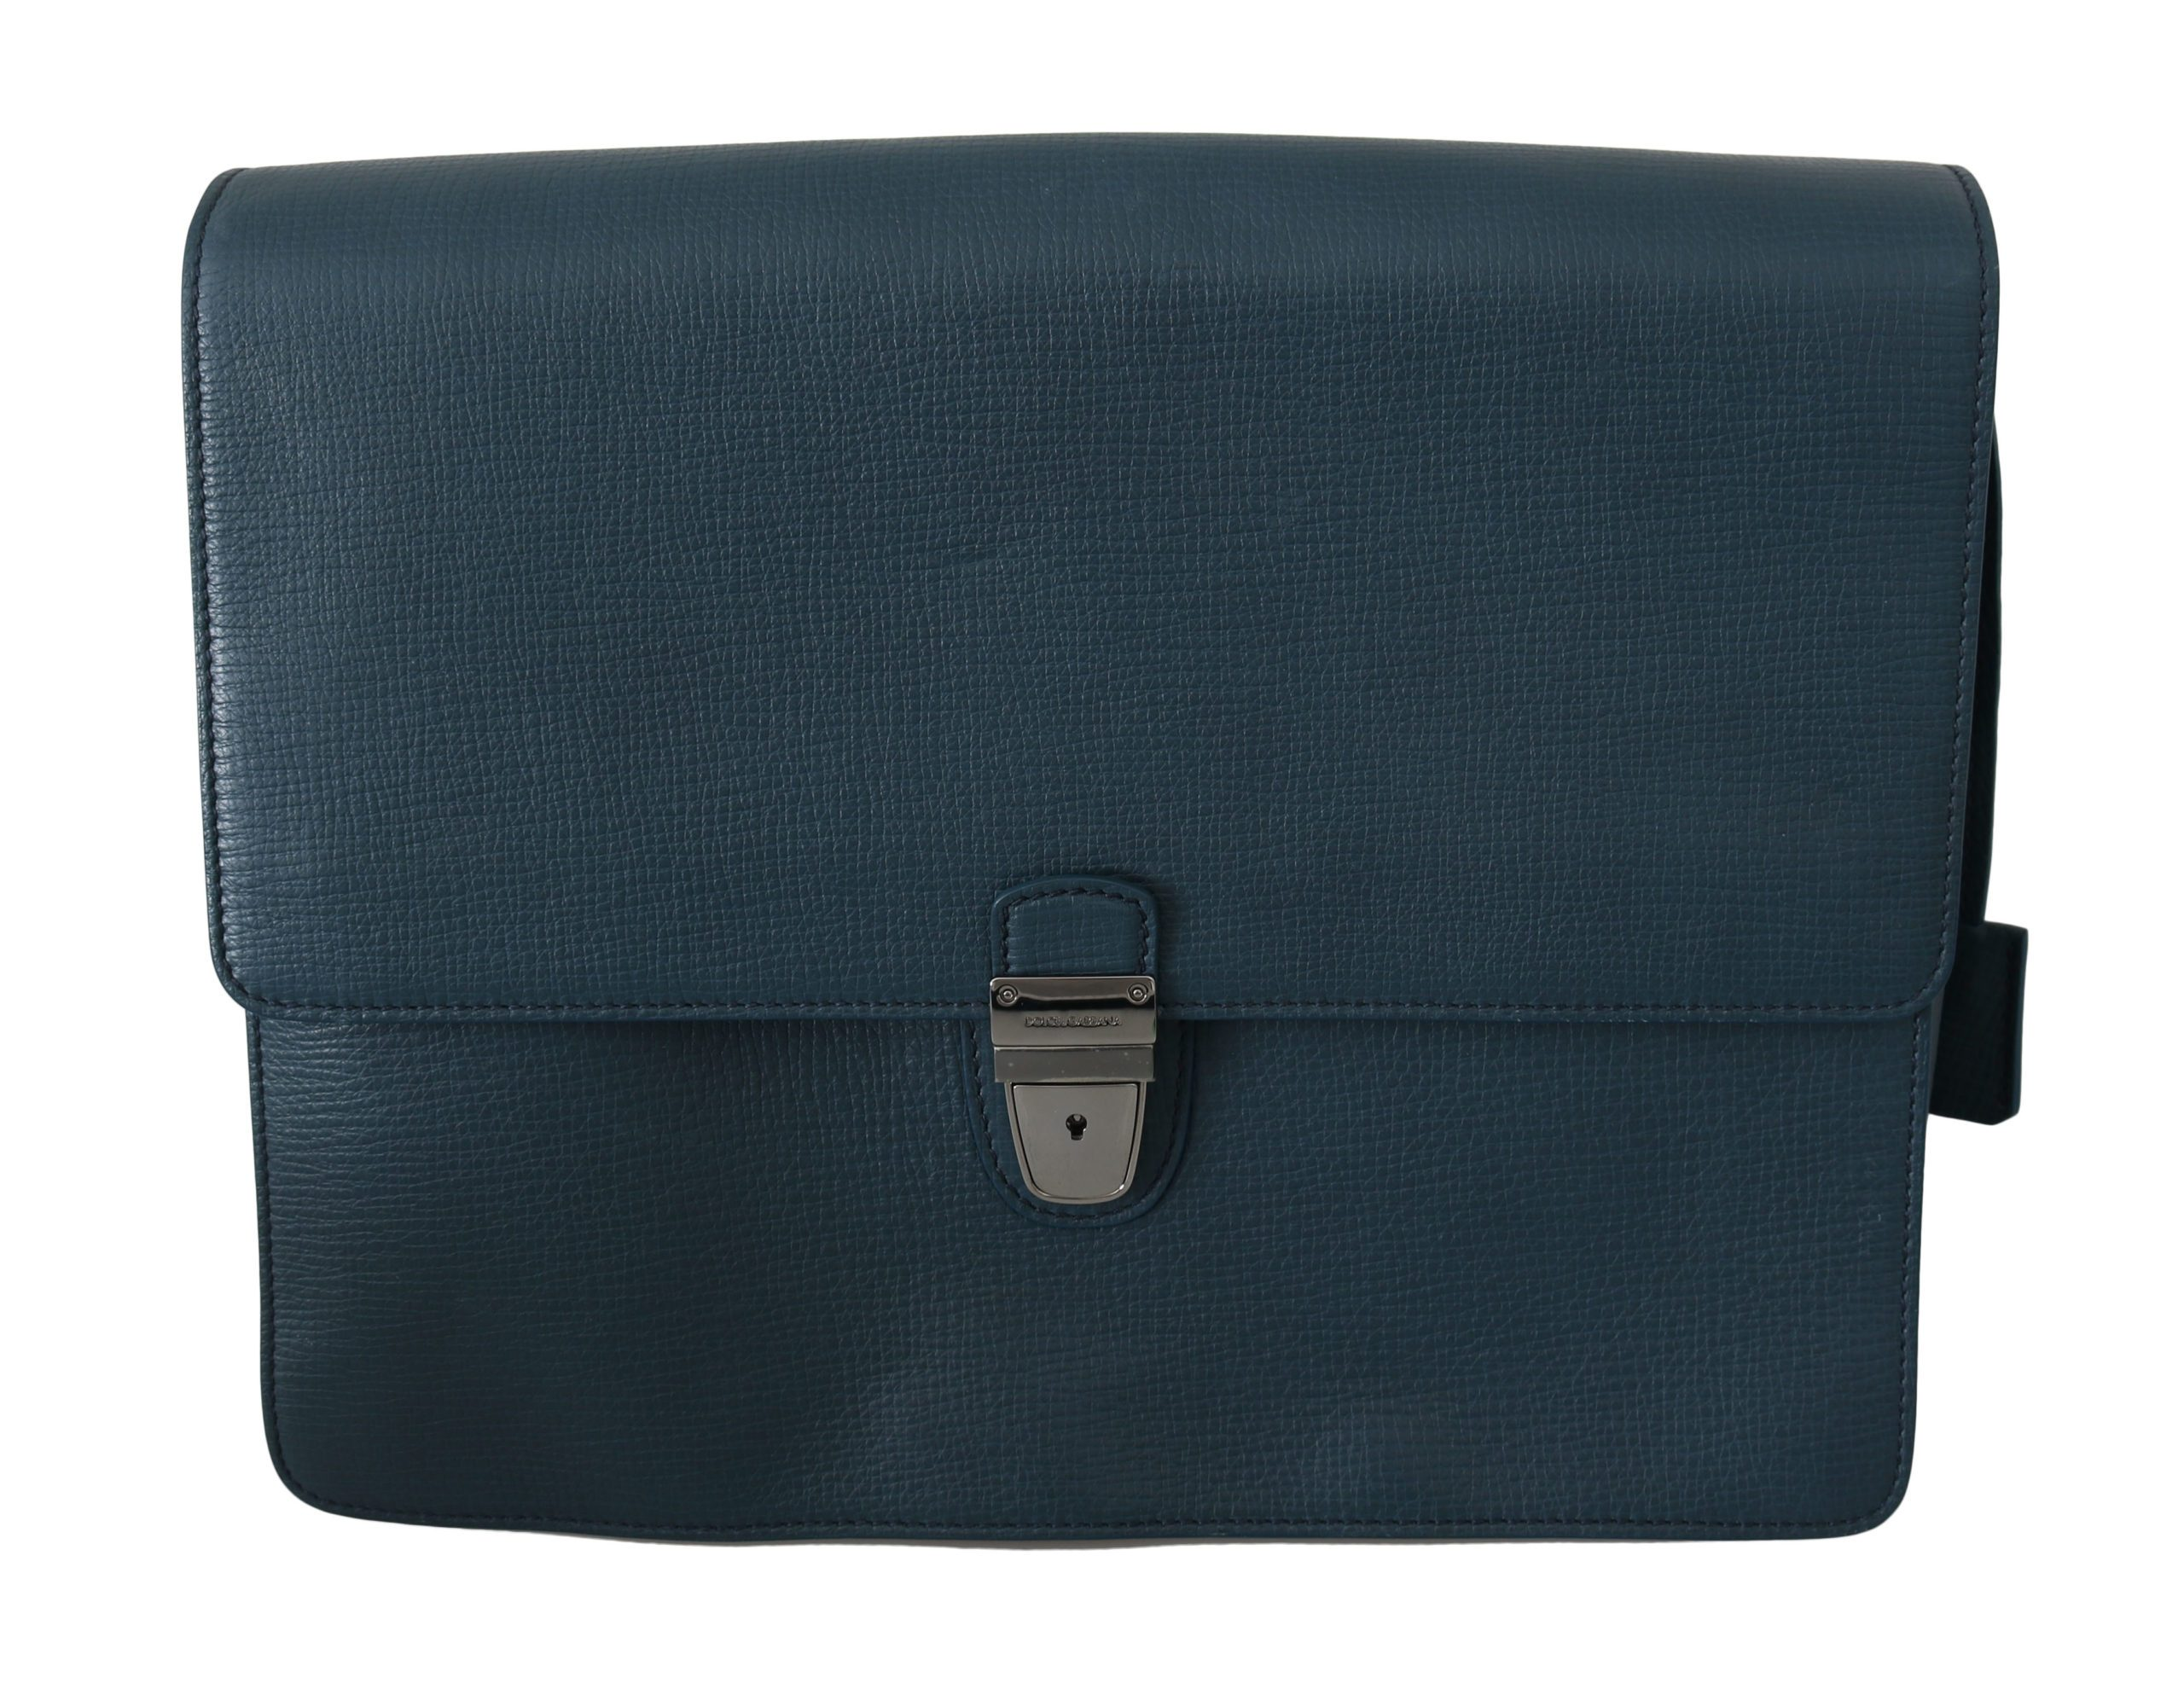 Dolce & Gabbana Men's Laptop Messenger Bag Blue VAS8710